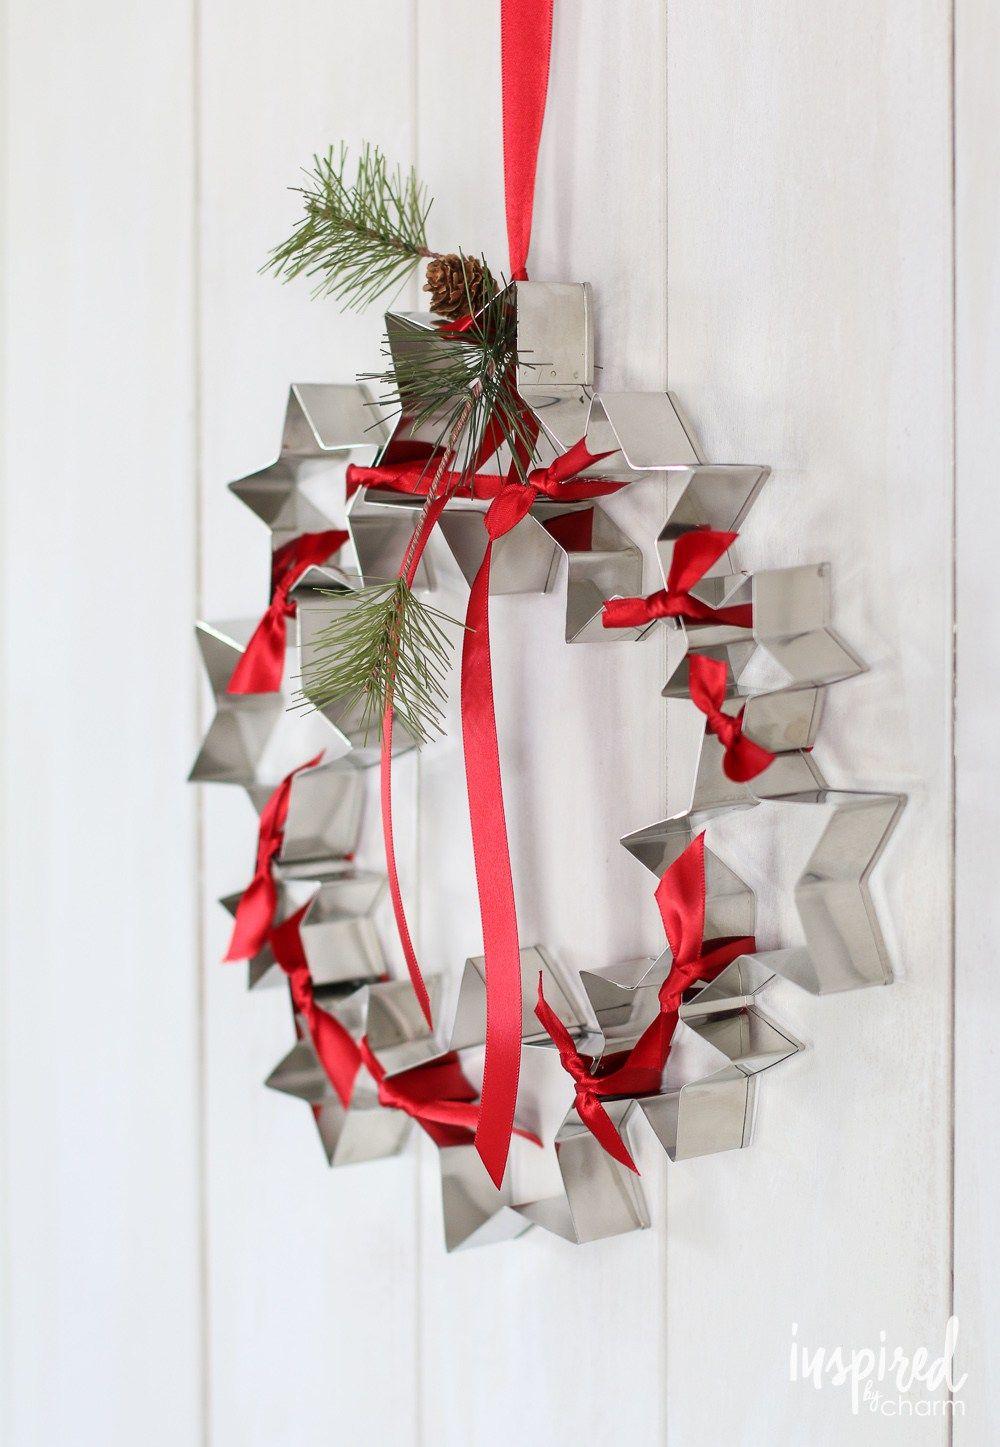 10 Handmade Ornaments to Make • Freutcake